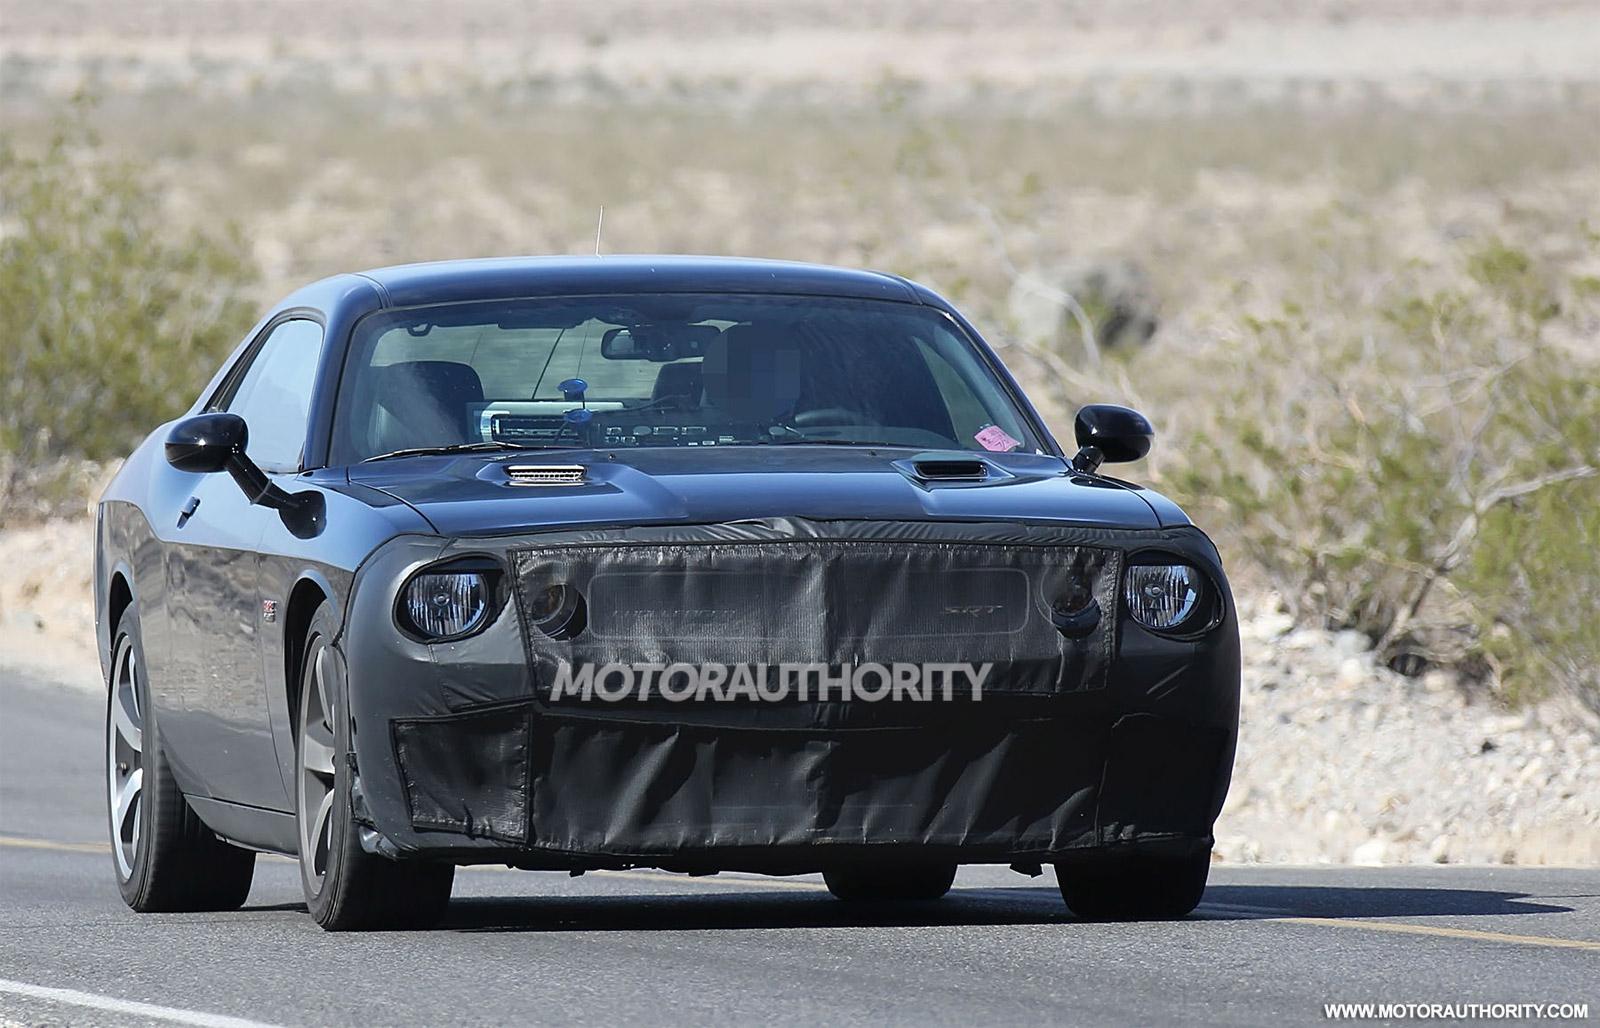 2015 Dodge Challenger Srt Hellcat Spy Shots